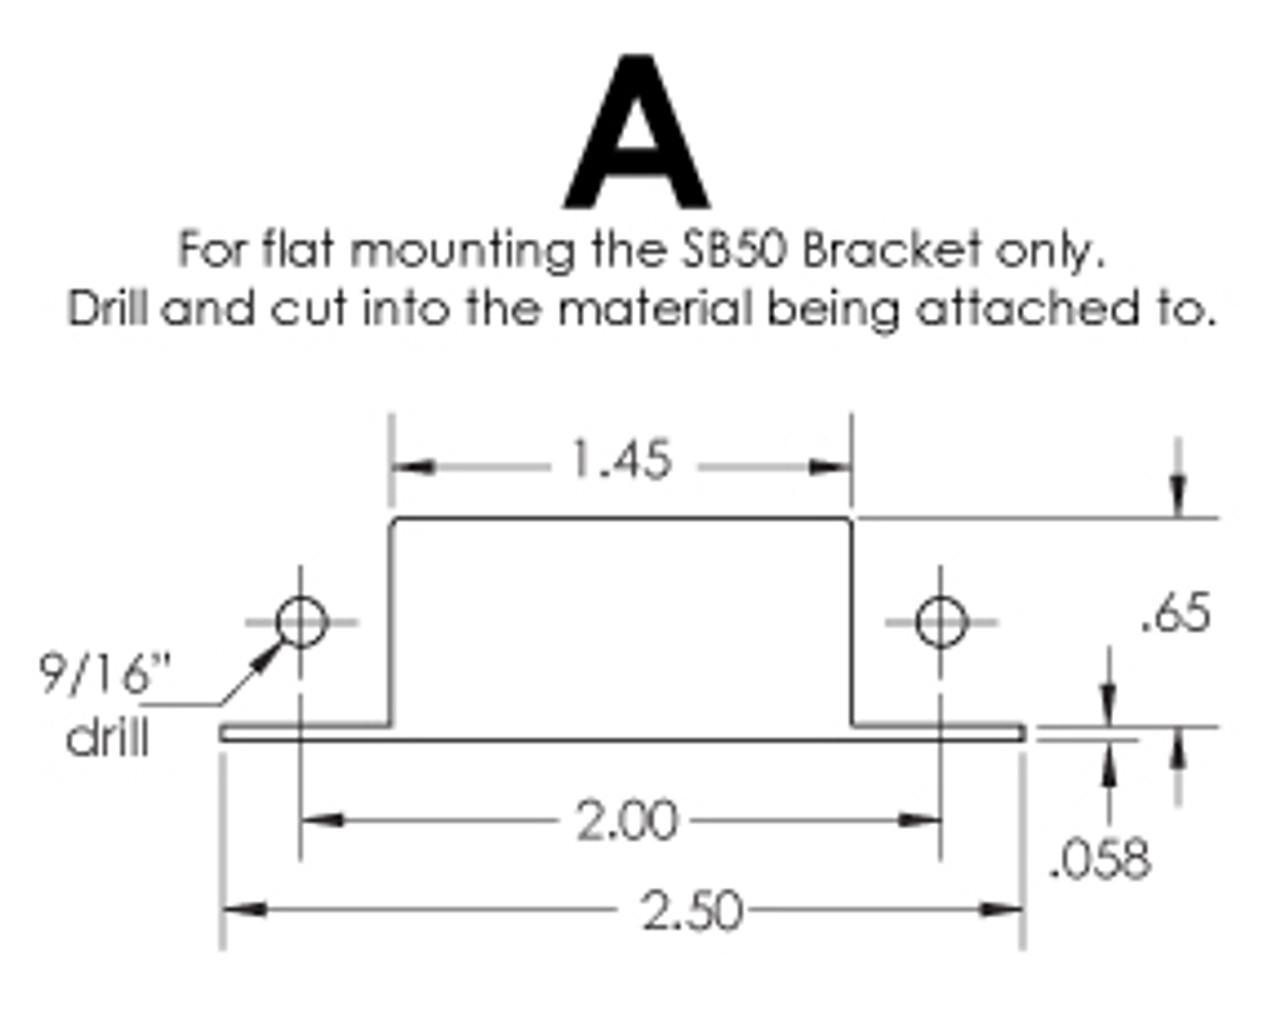 anderson sb50 edgestar fridge to battery complete wiring kit apc 5 edgestar wiring diagram [ 1280 x 1022 Pixel ]